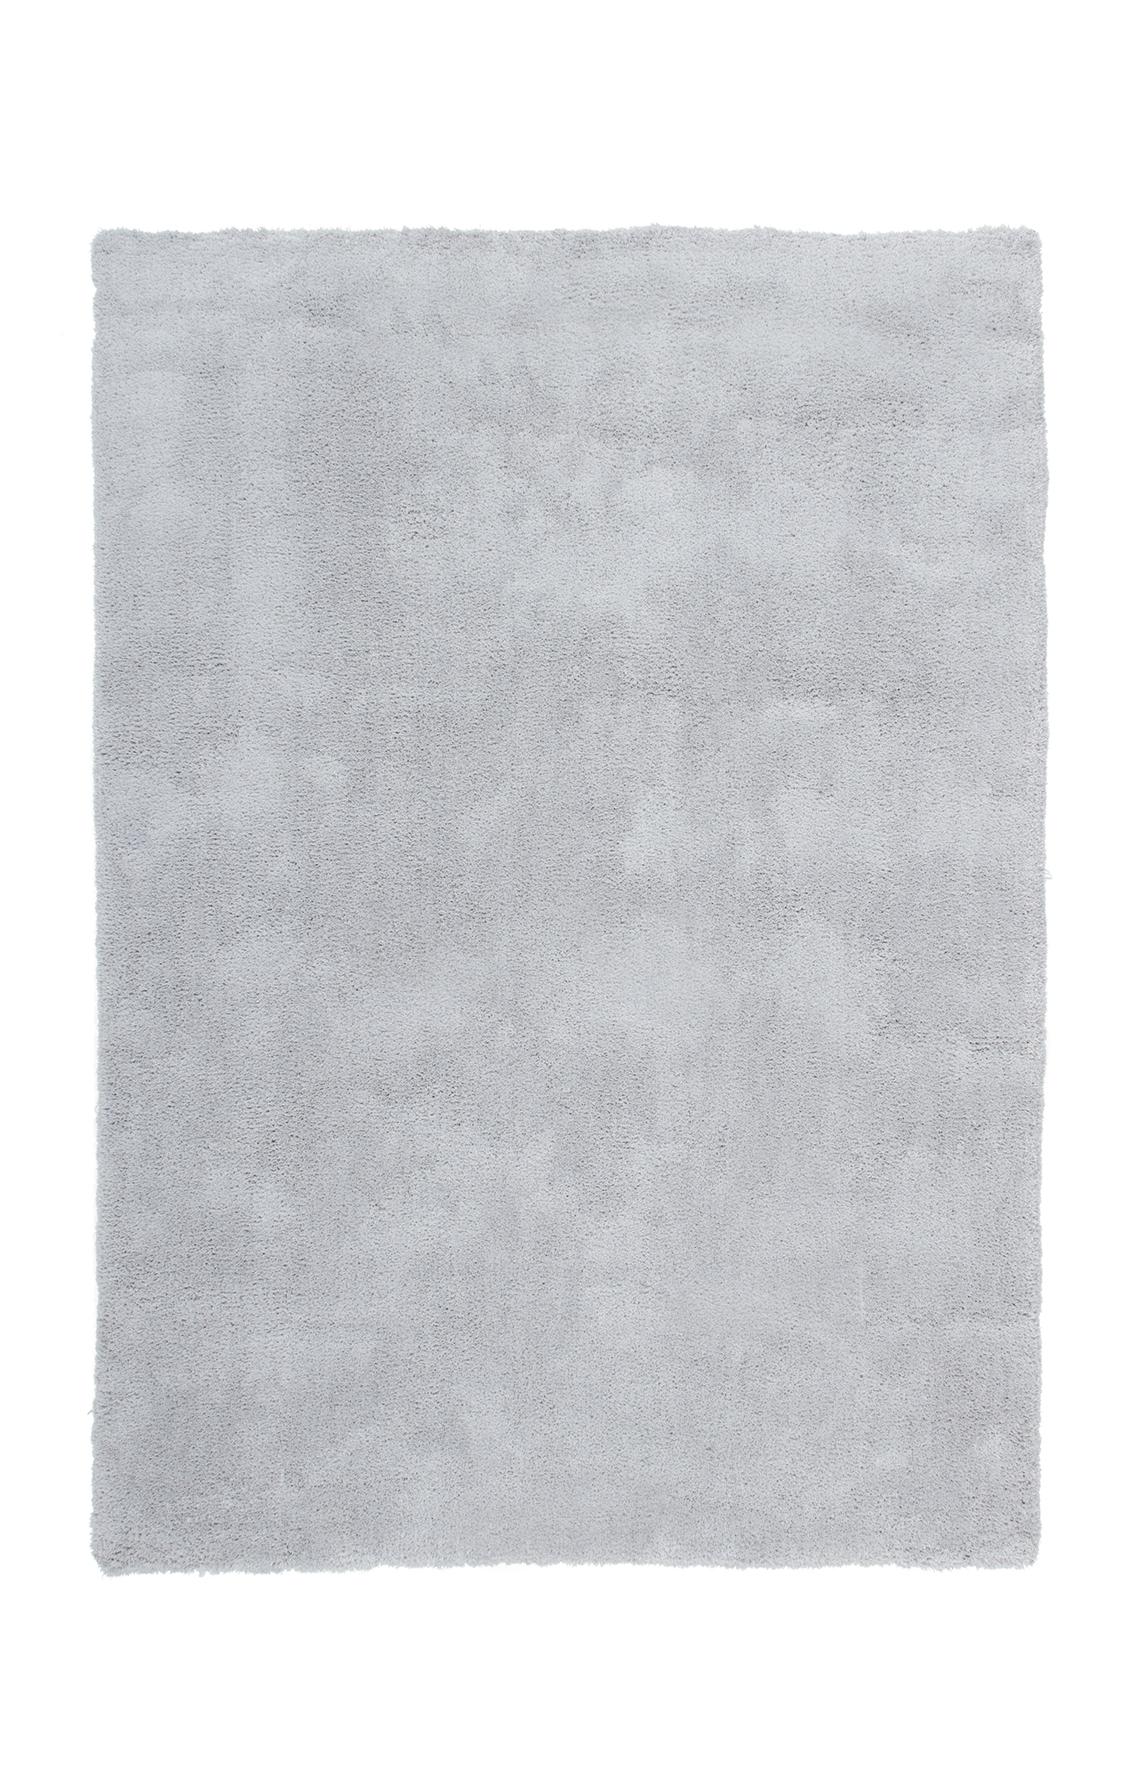 Obsession koberce Kusový koberec PARADISE 400 SILVER - 200x290 cm